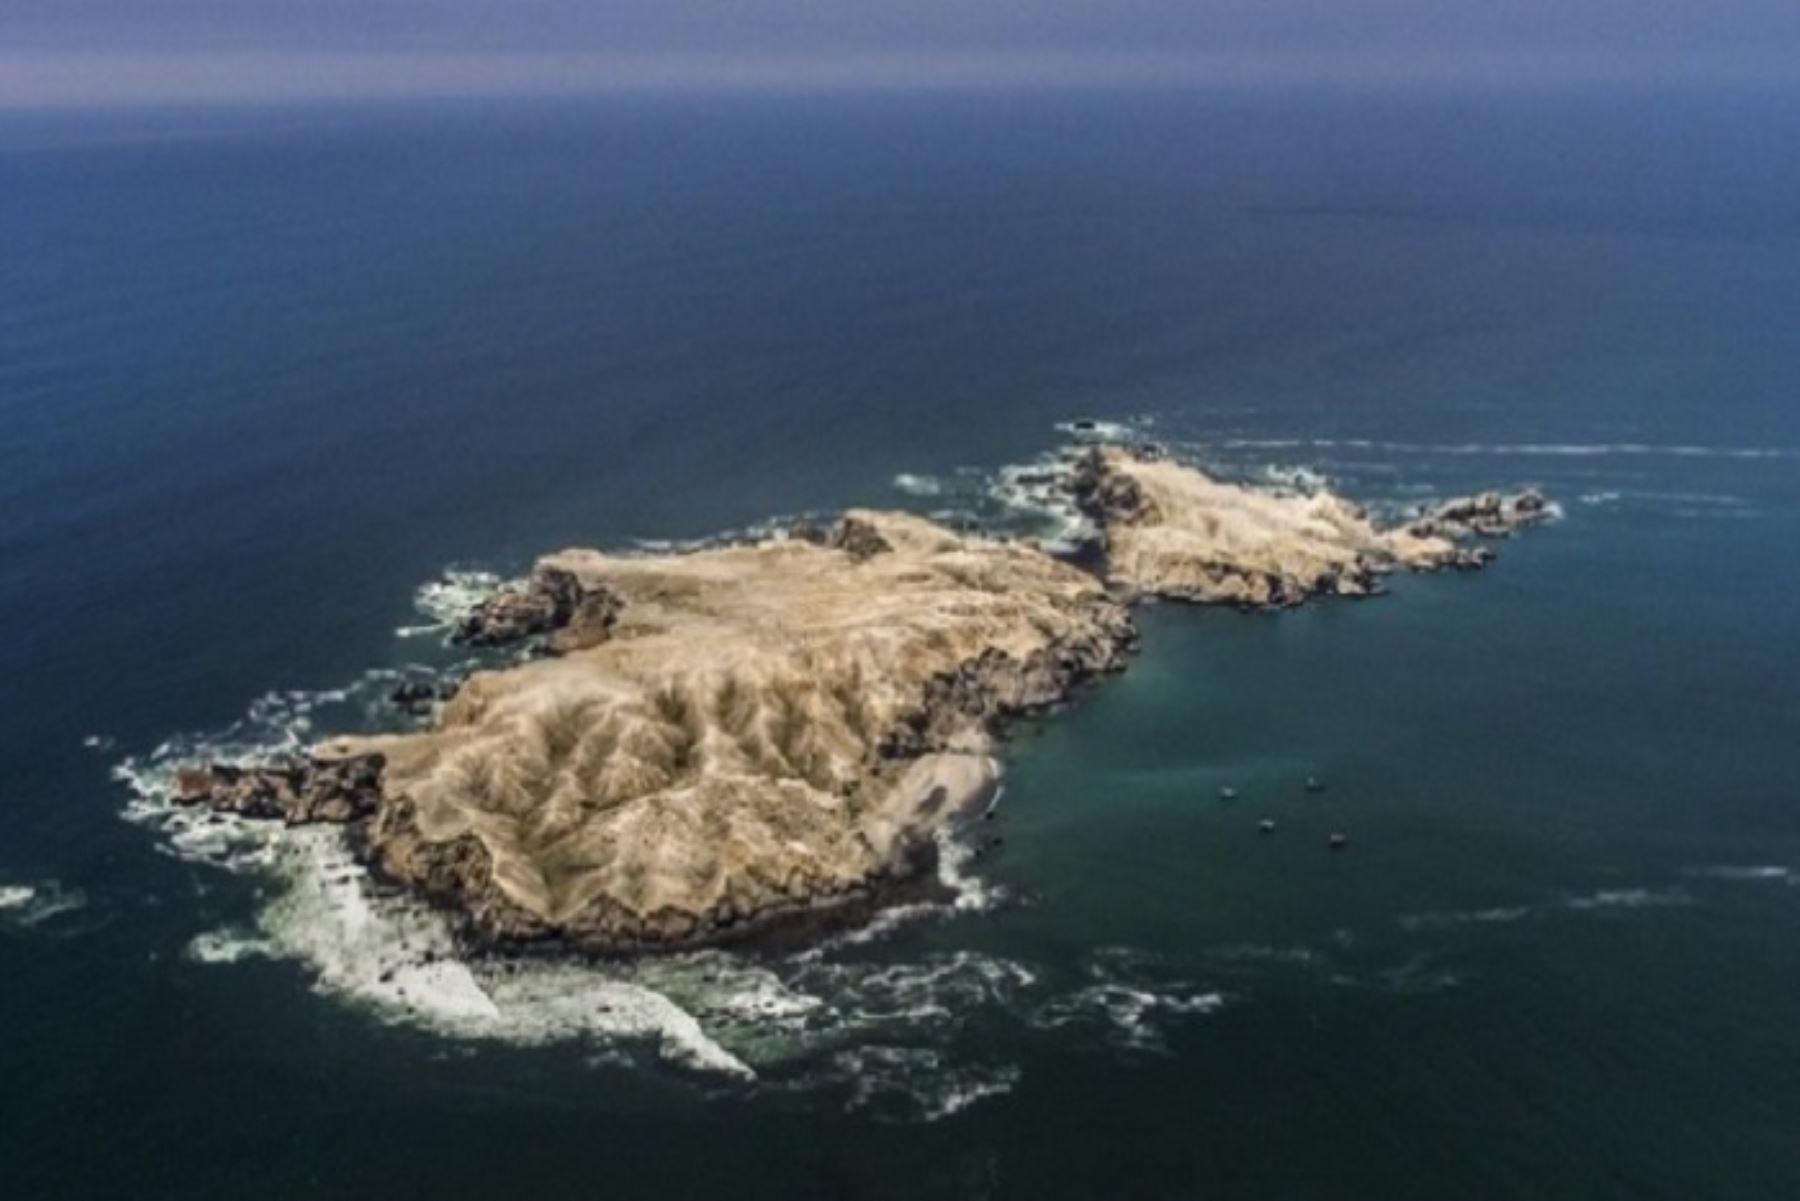 Minam impulsa proyecto multisectorial para conservar territorios marino costeros del país